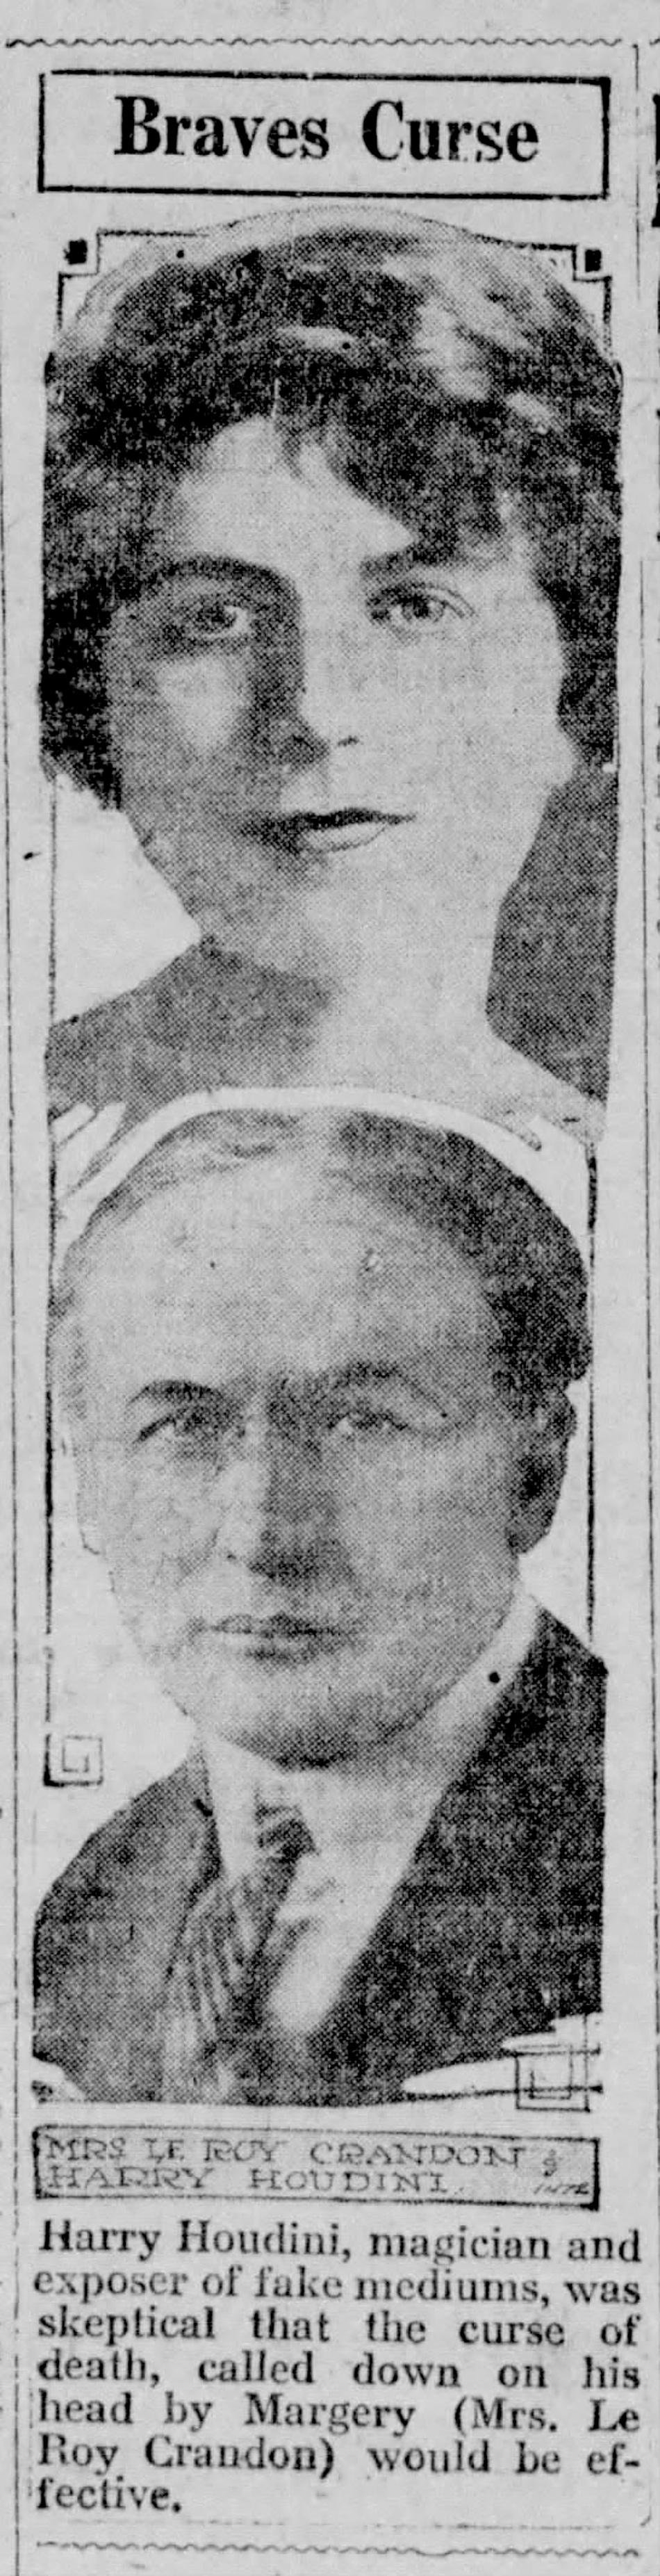 Mina Stinson Crandon and Harry Houdini in a Pennsylvania newspaper, 1925